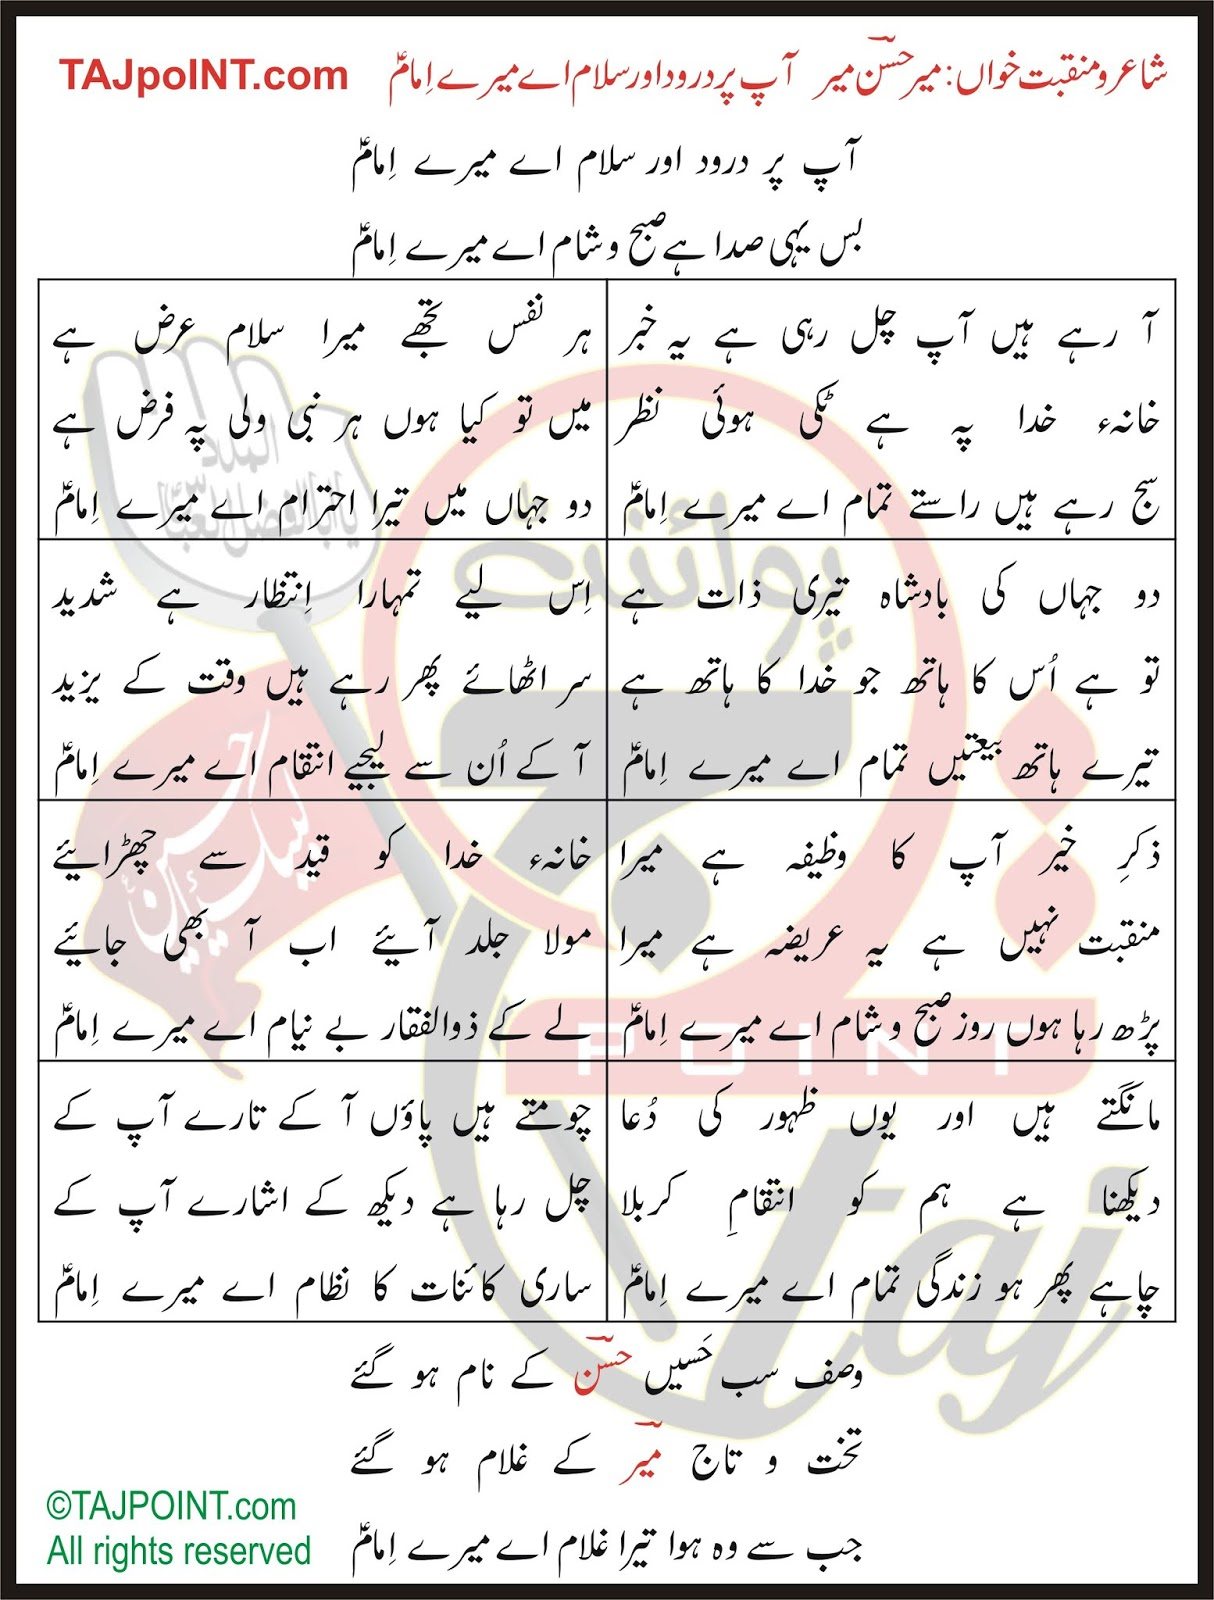 Aap Par Darood Our Salam Aye Mere Imam Lyrics In Urdu and